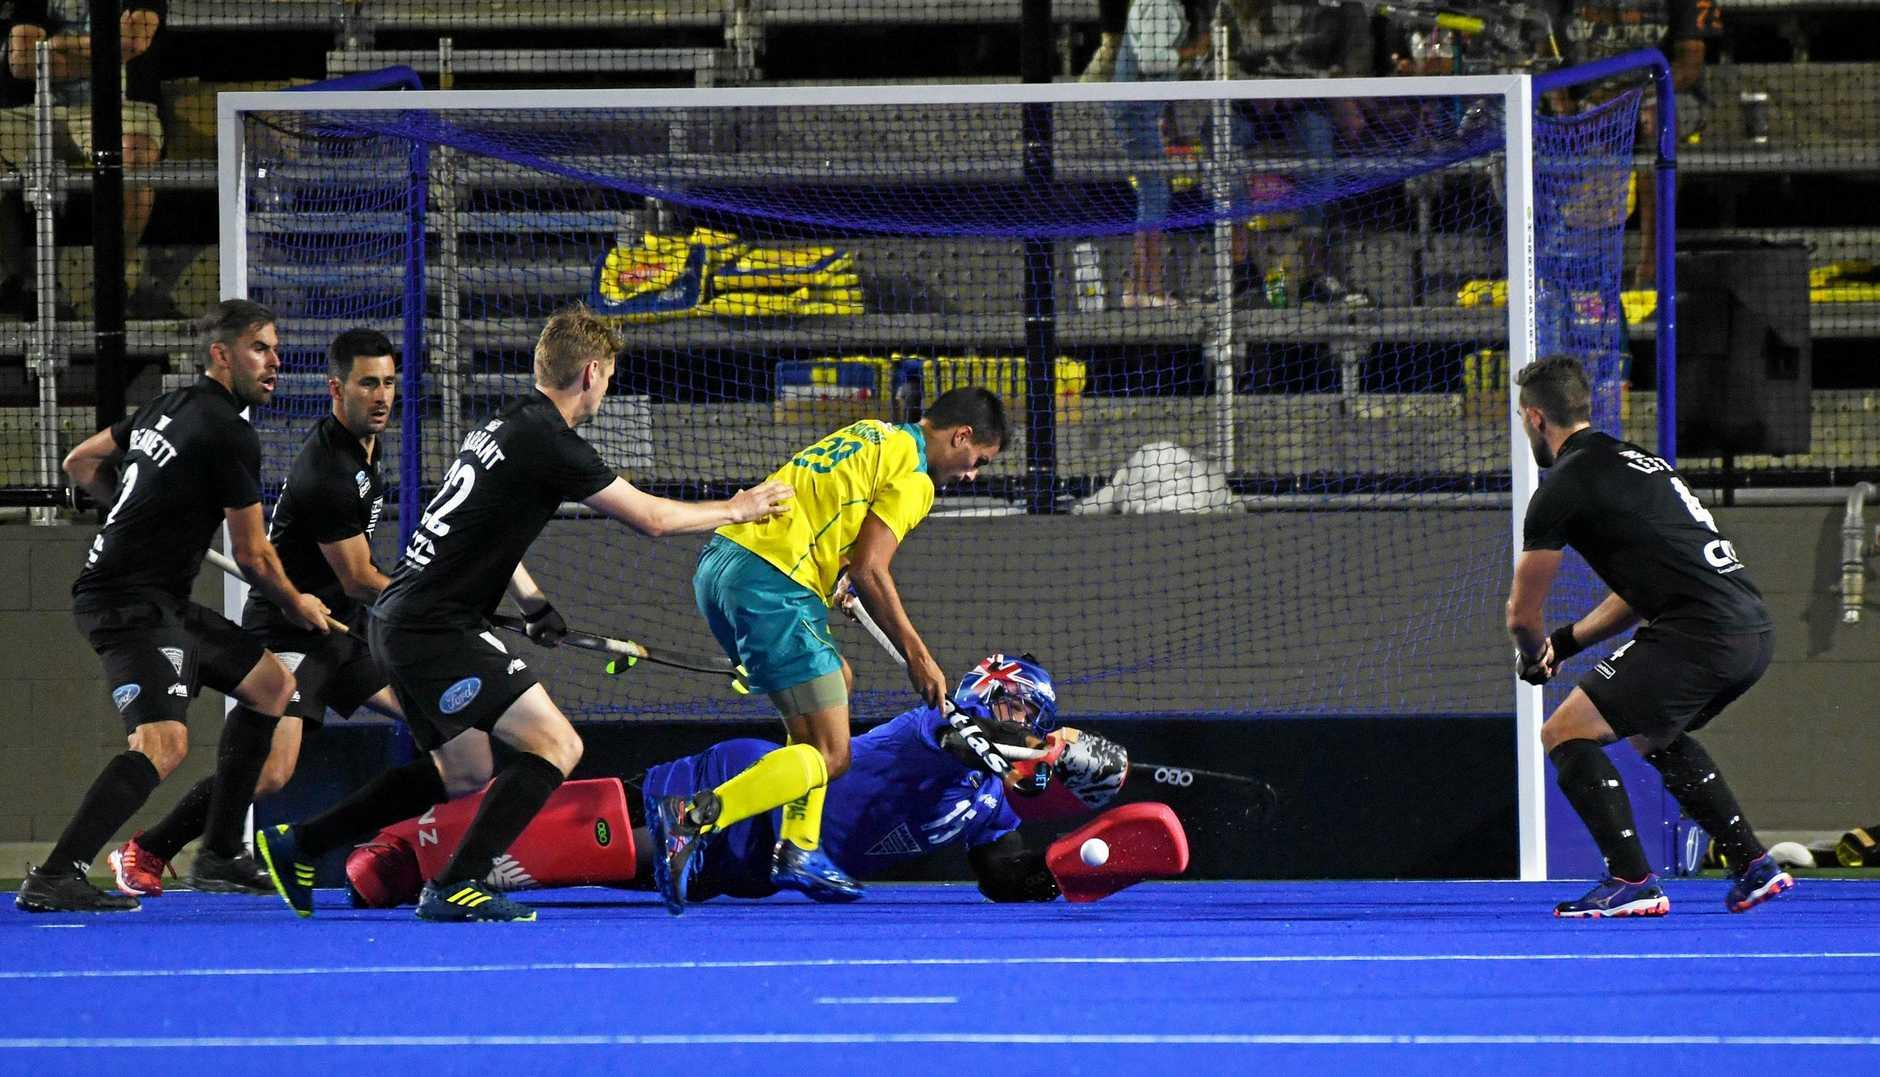 Hockey: Australia's Tim Brand and New Zealand's GK George Enersen.